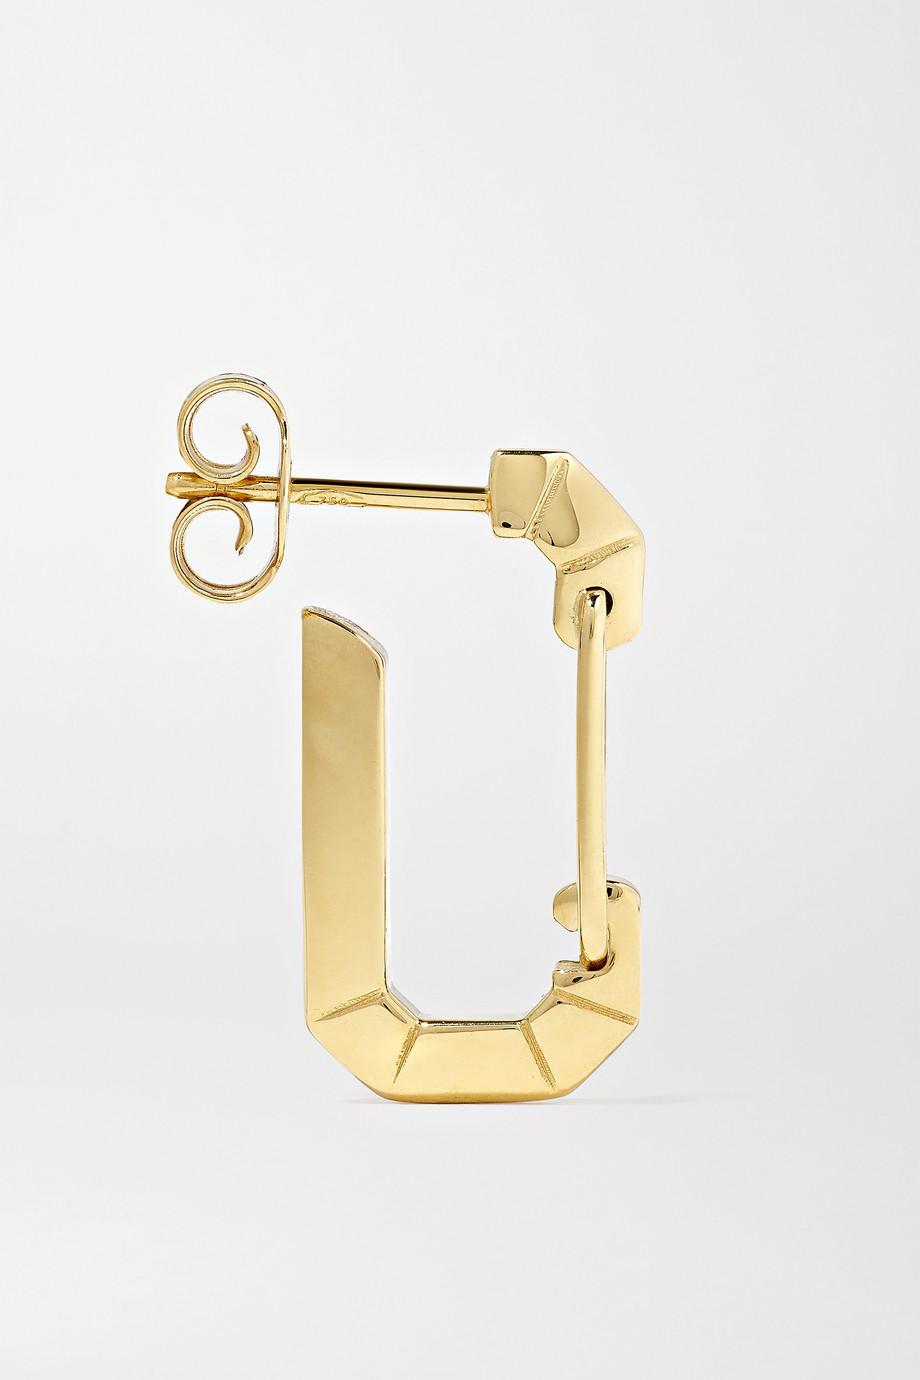 EÉRA 18-karat gold earring